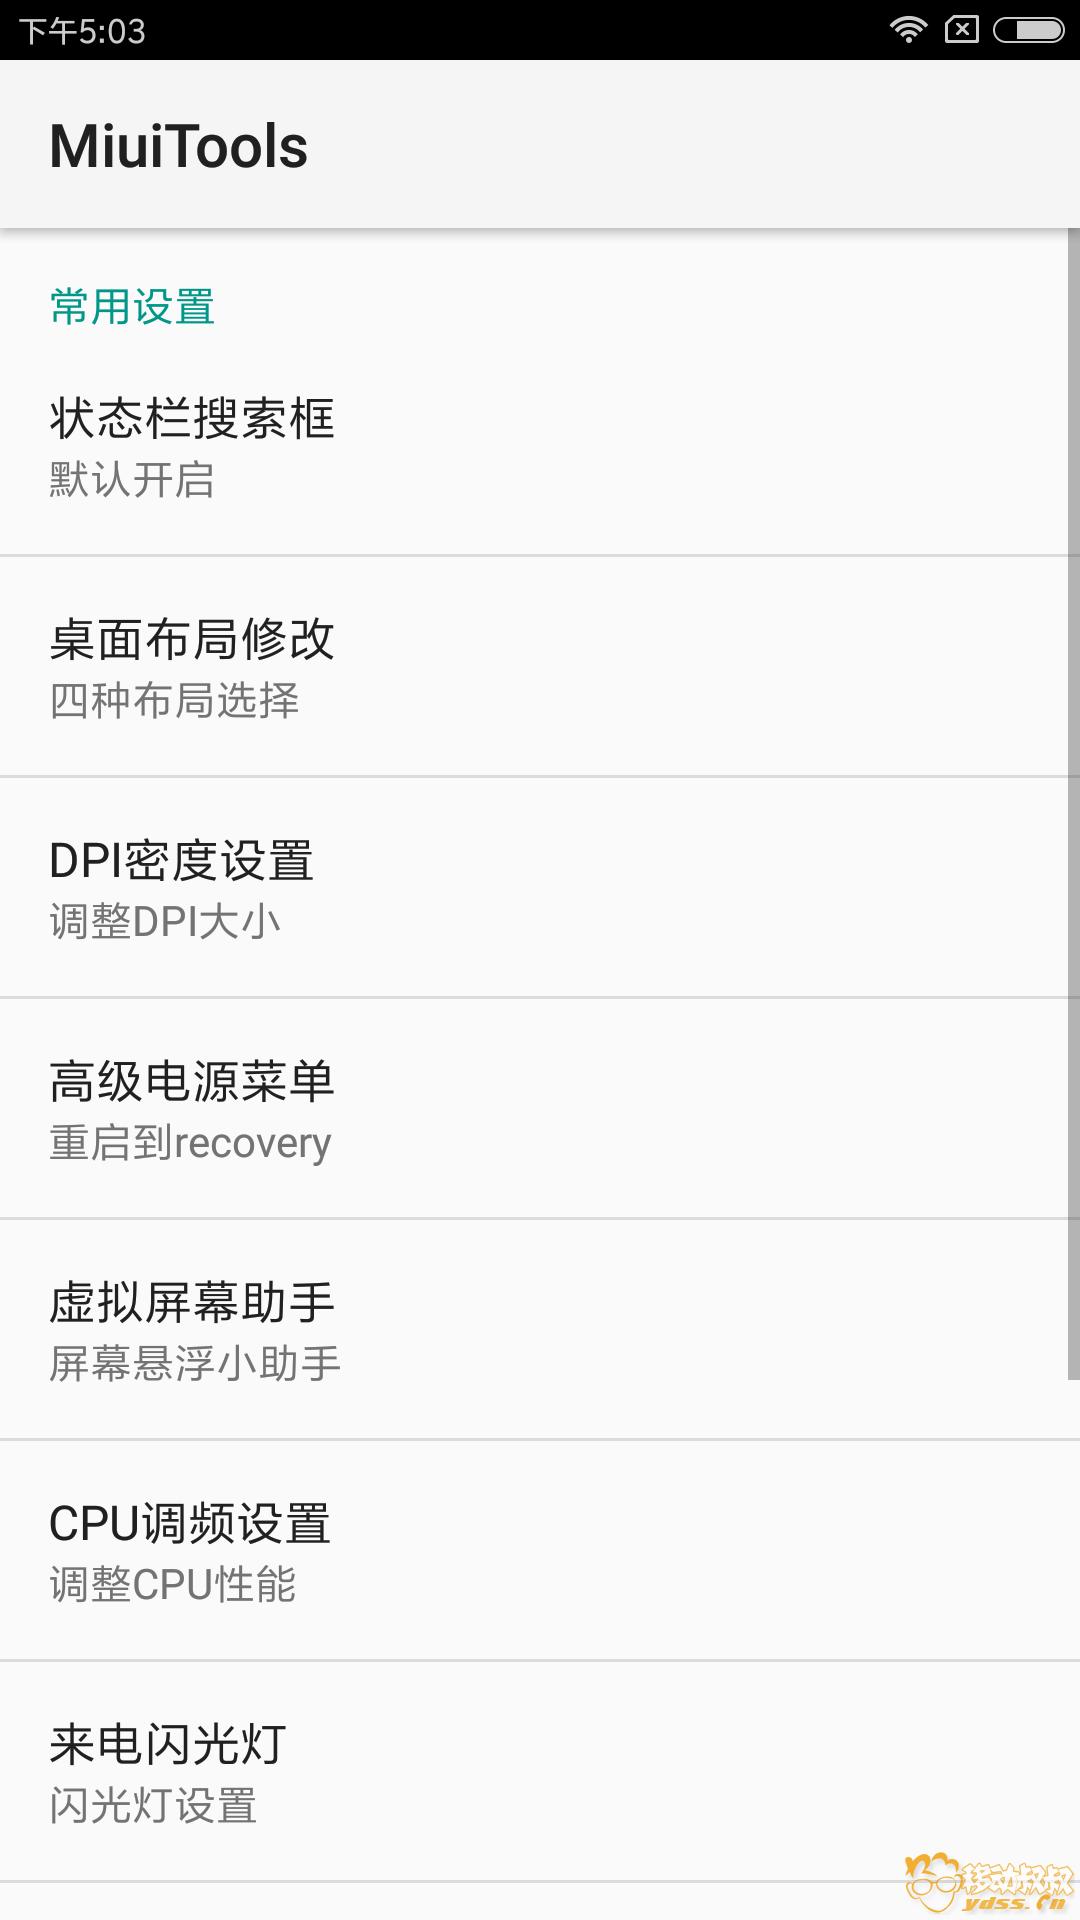 Screenshot_2018-03-10-17-03-01-779_com.anzhi.hwsettings.png